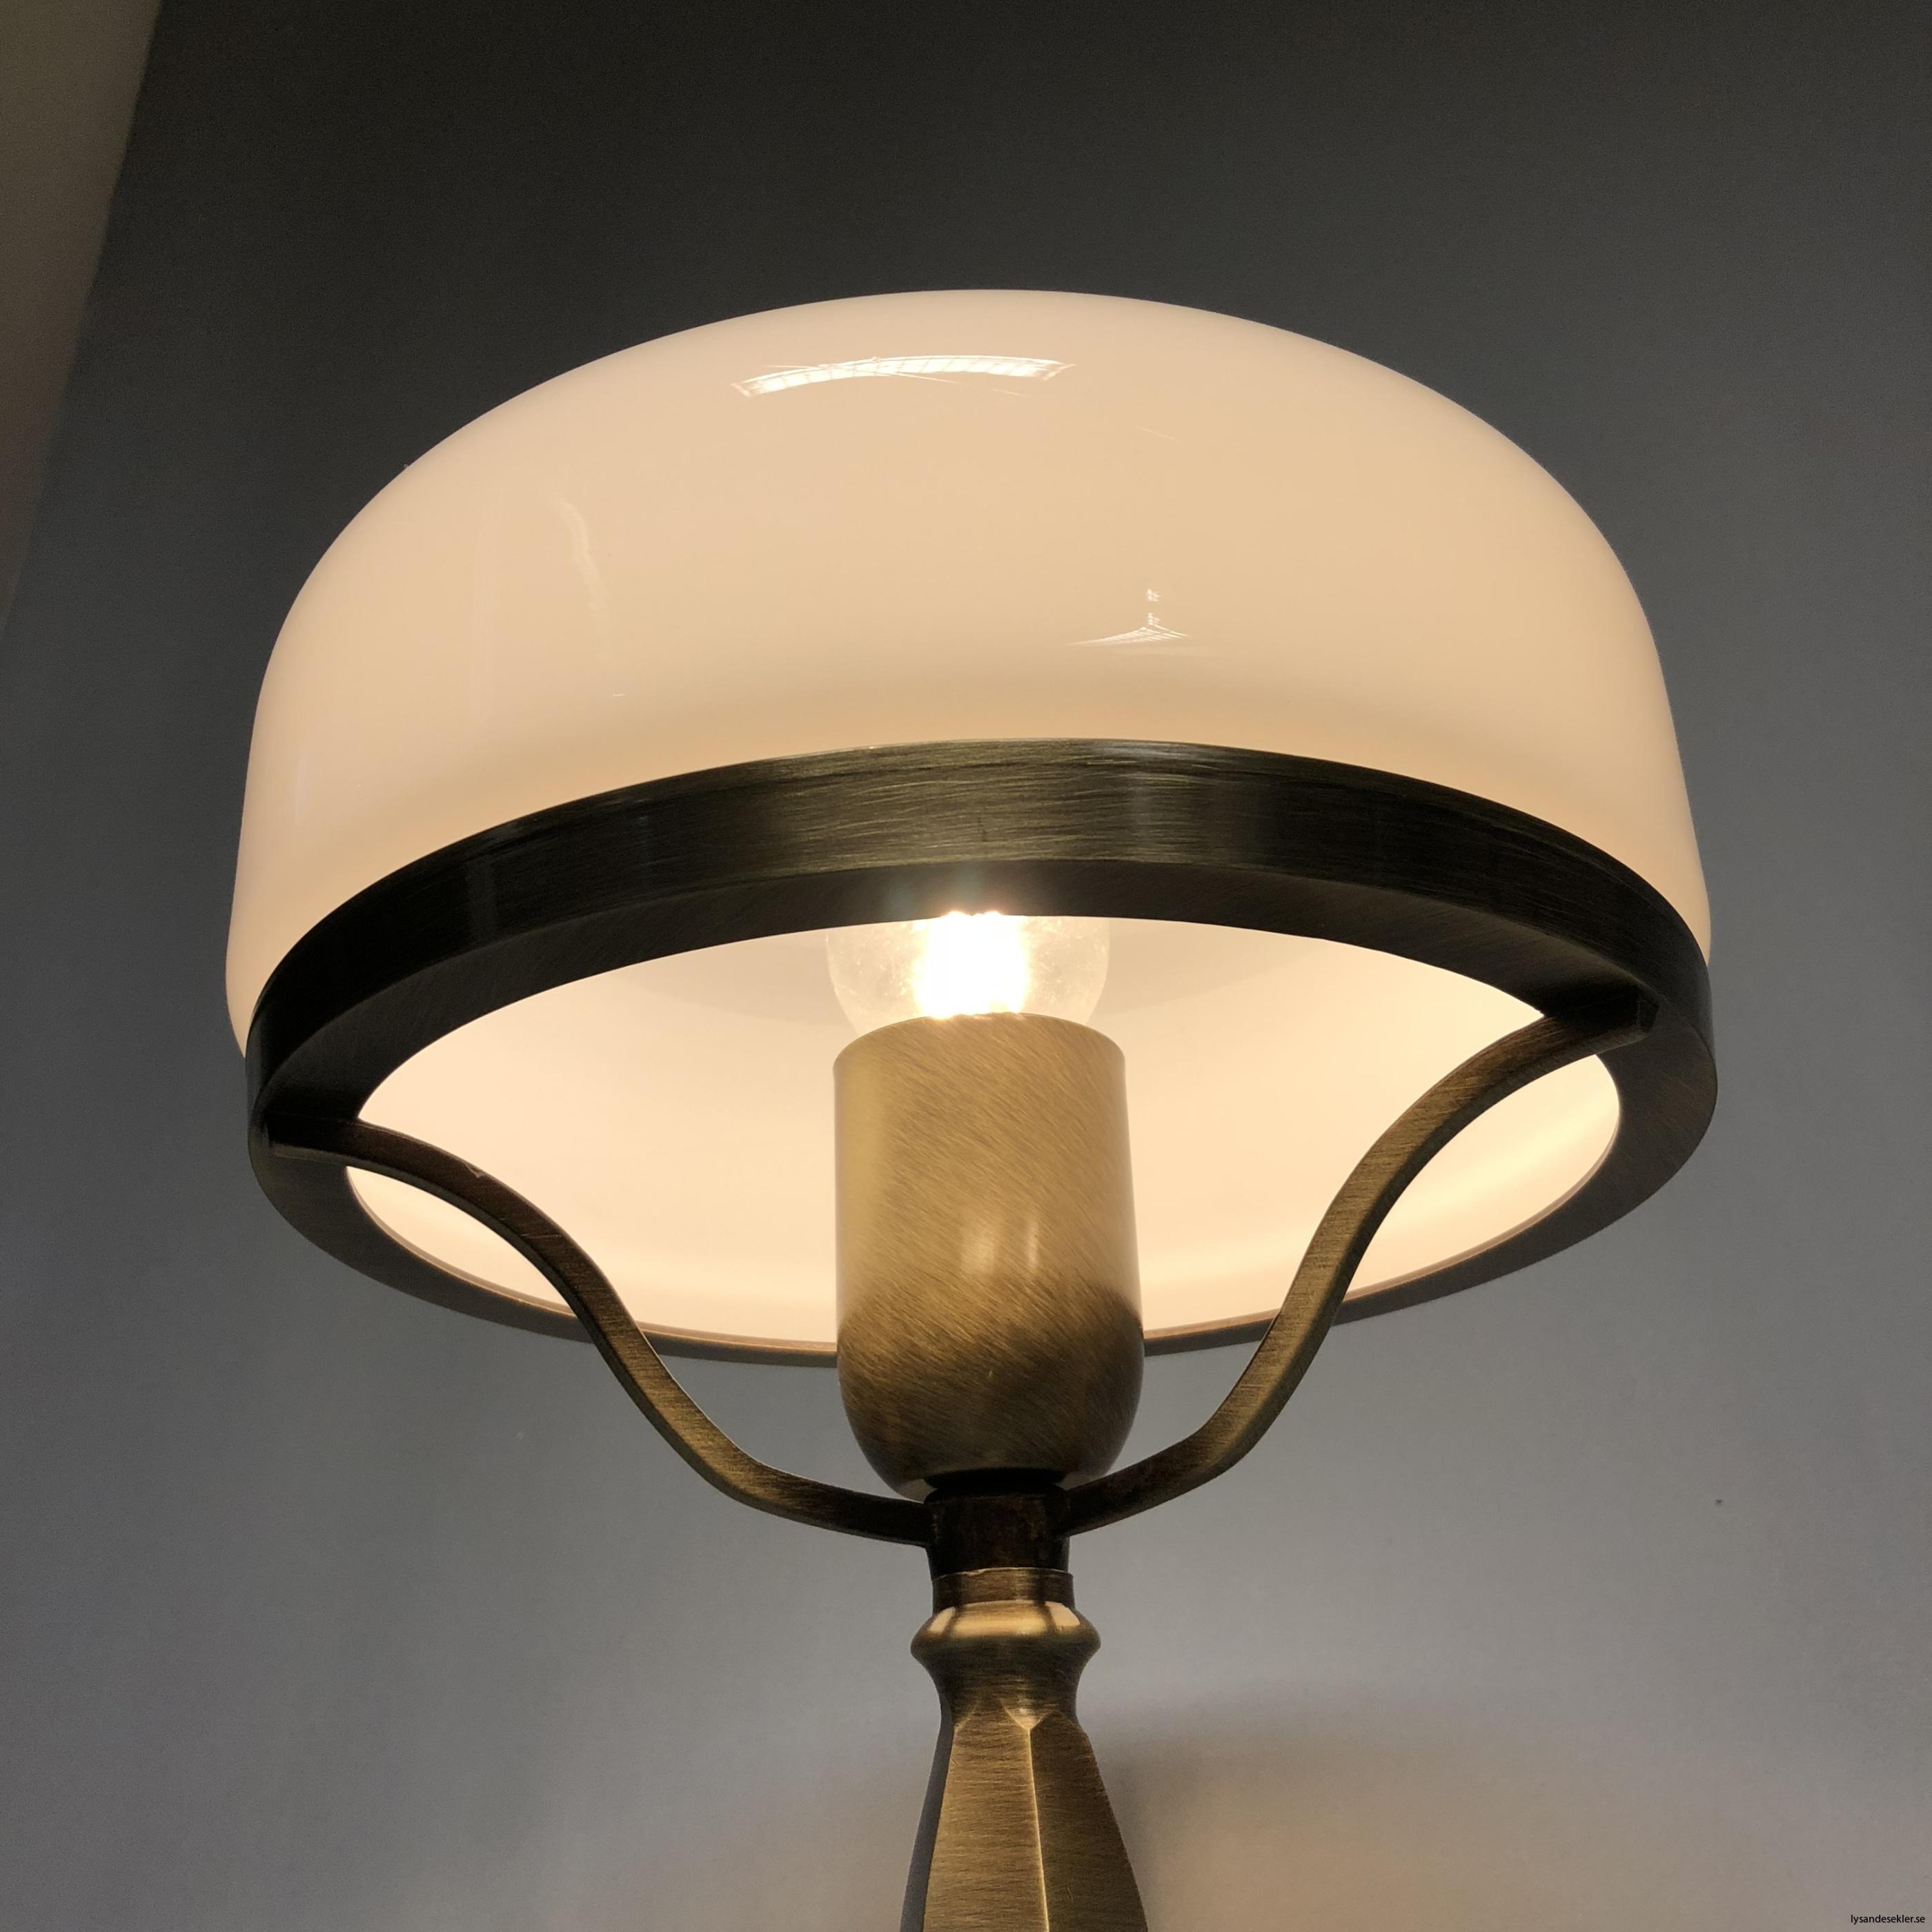 strindbergslampa strindbergslampor strindberg lampa skärm kupa strindbergsskärm strindbergskupa15